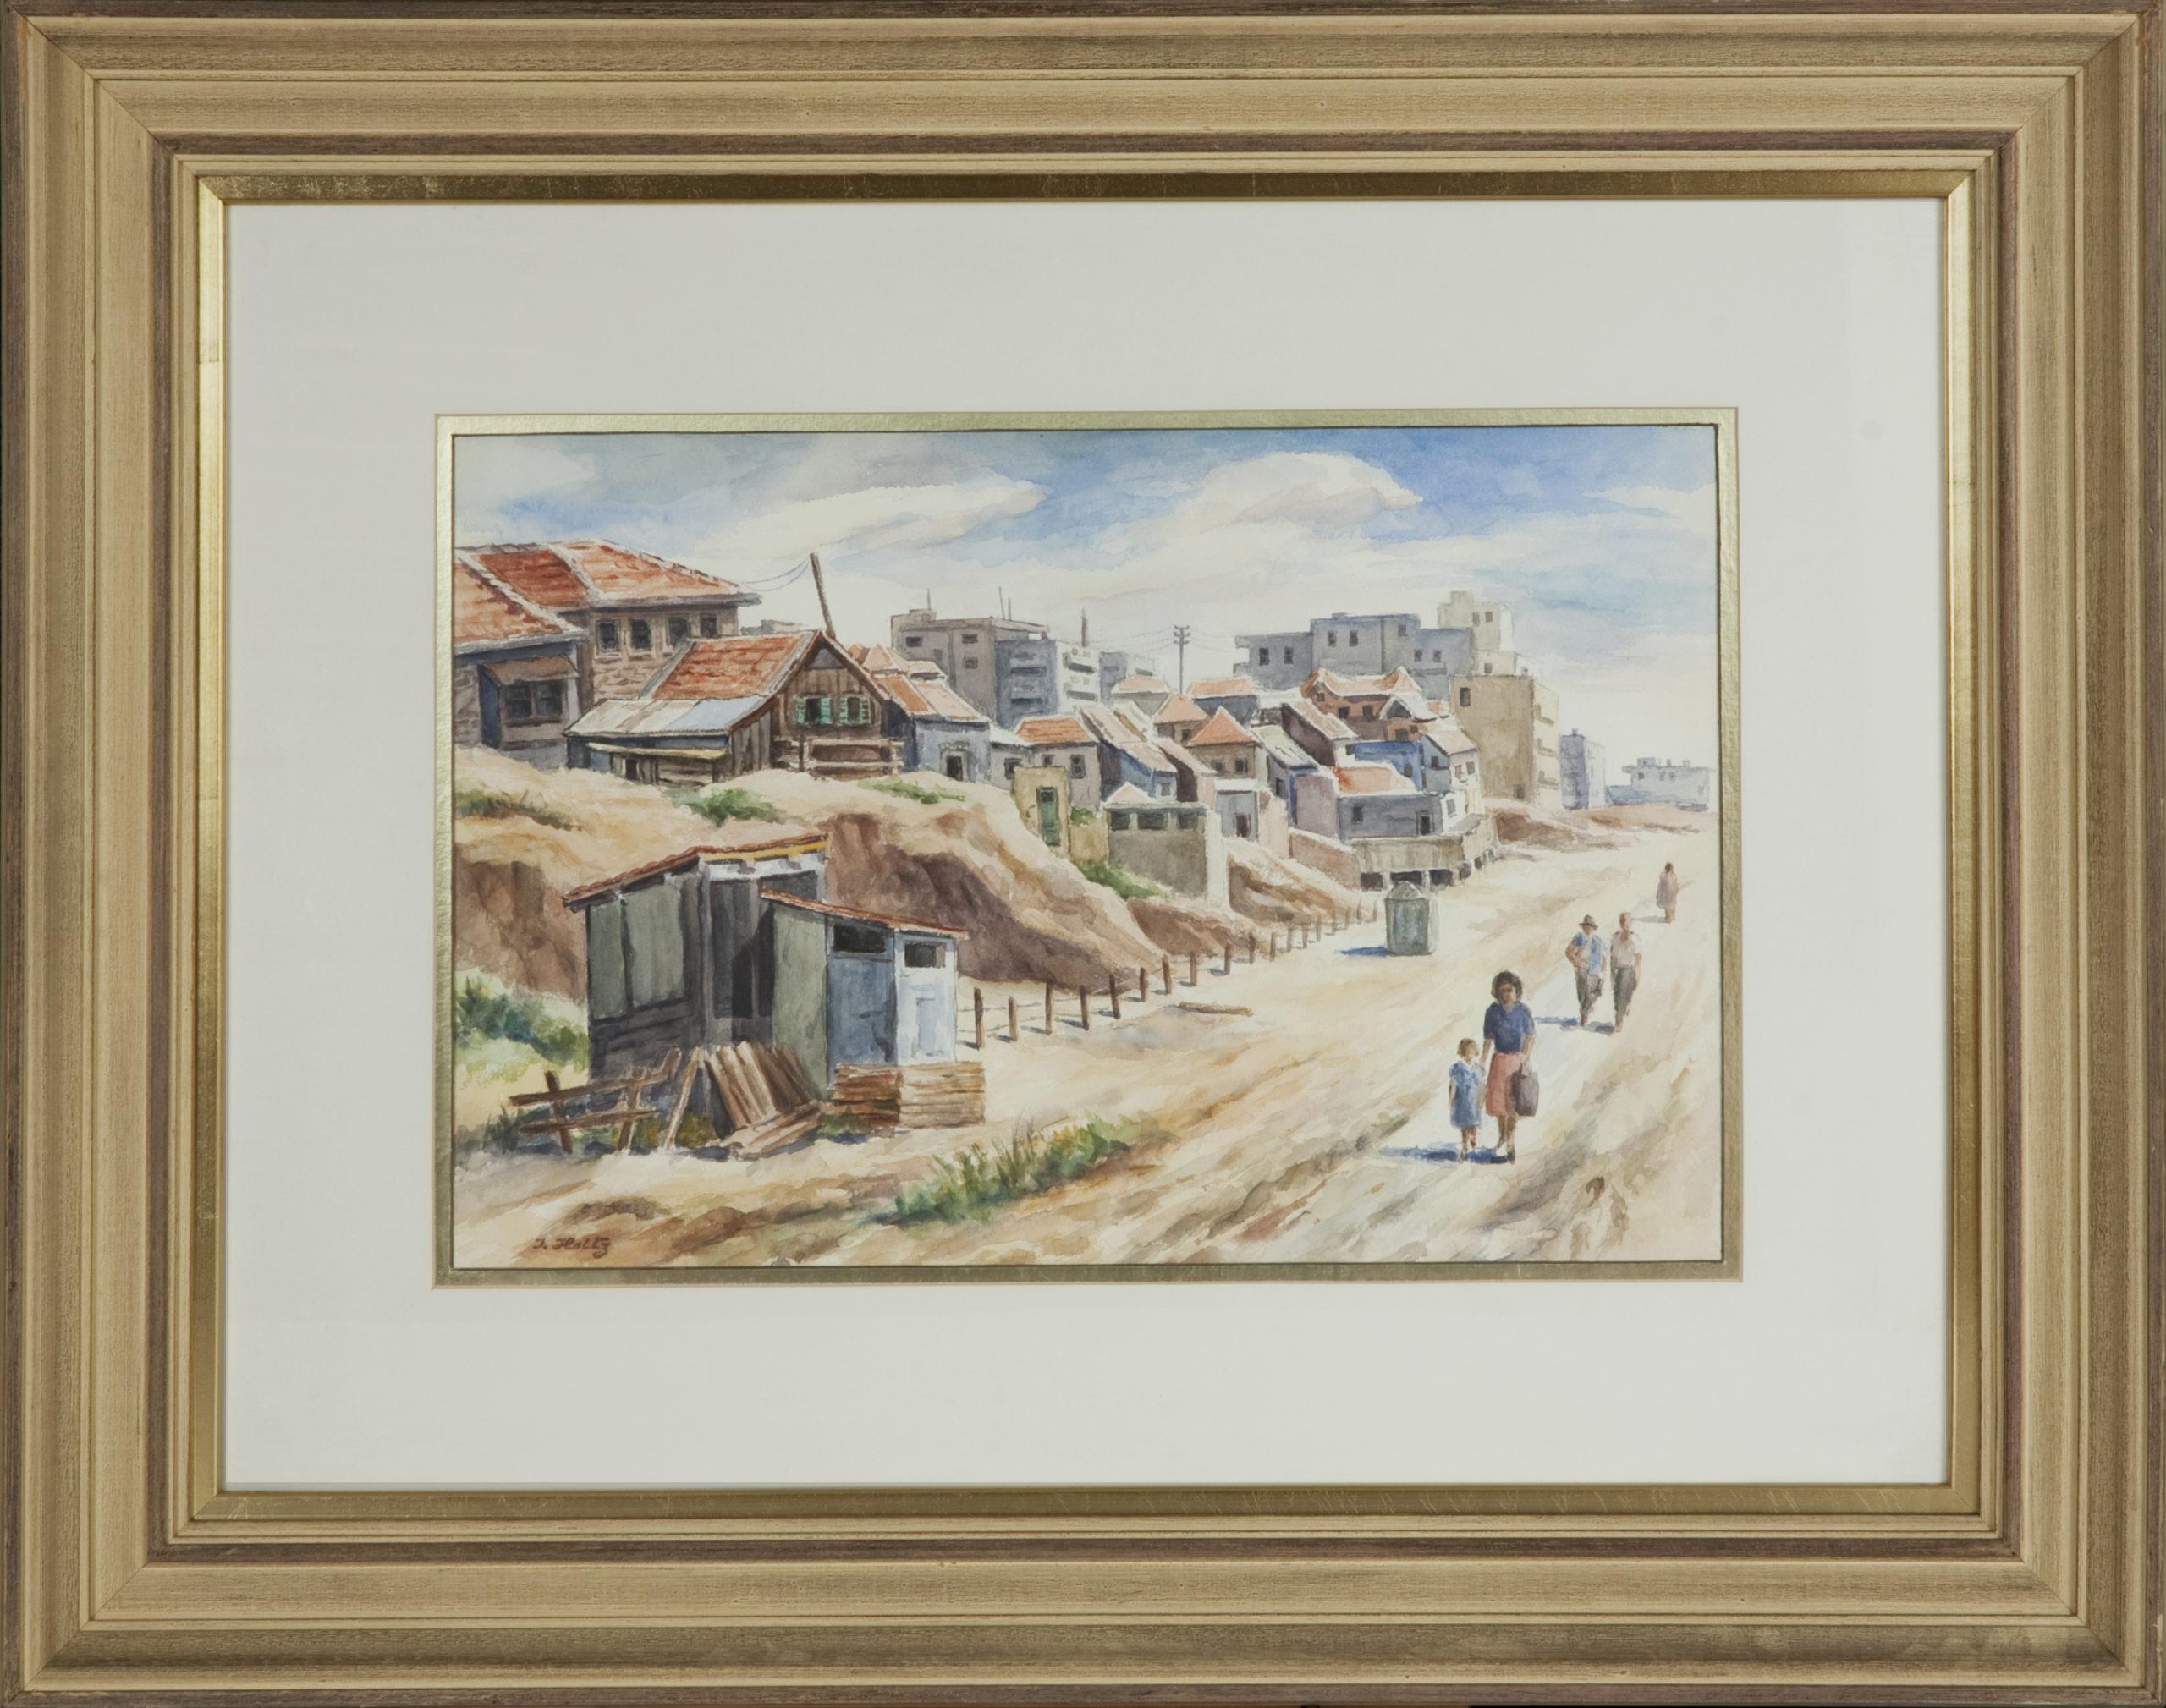 248 Tel-Aviv 1959 - Watercolor - 12 x 18 - Frame: 29.5 x 23.25 x 2.25